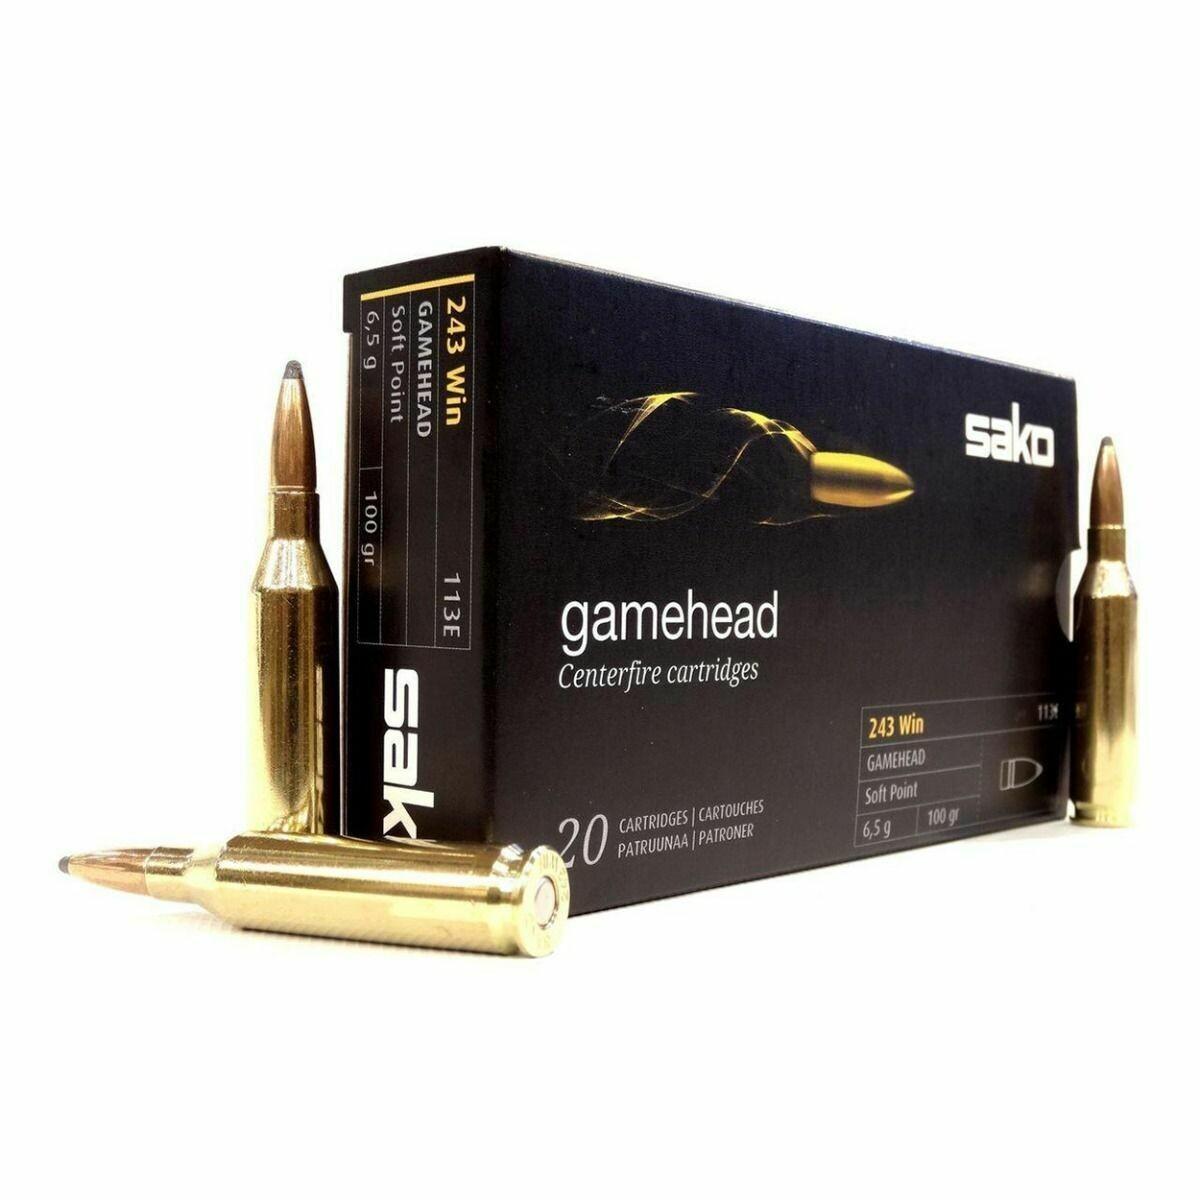 Sako .243 Gamehead Soft Point 100gr, 20 rounds per box